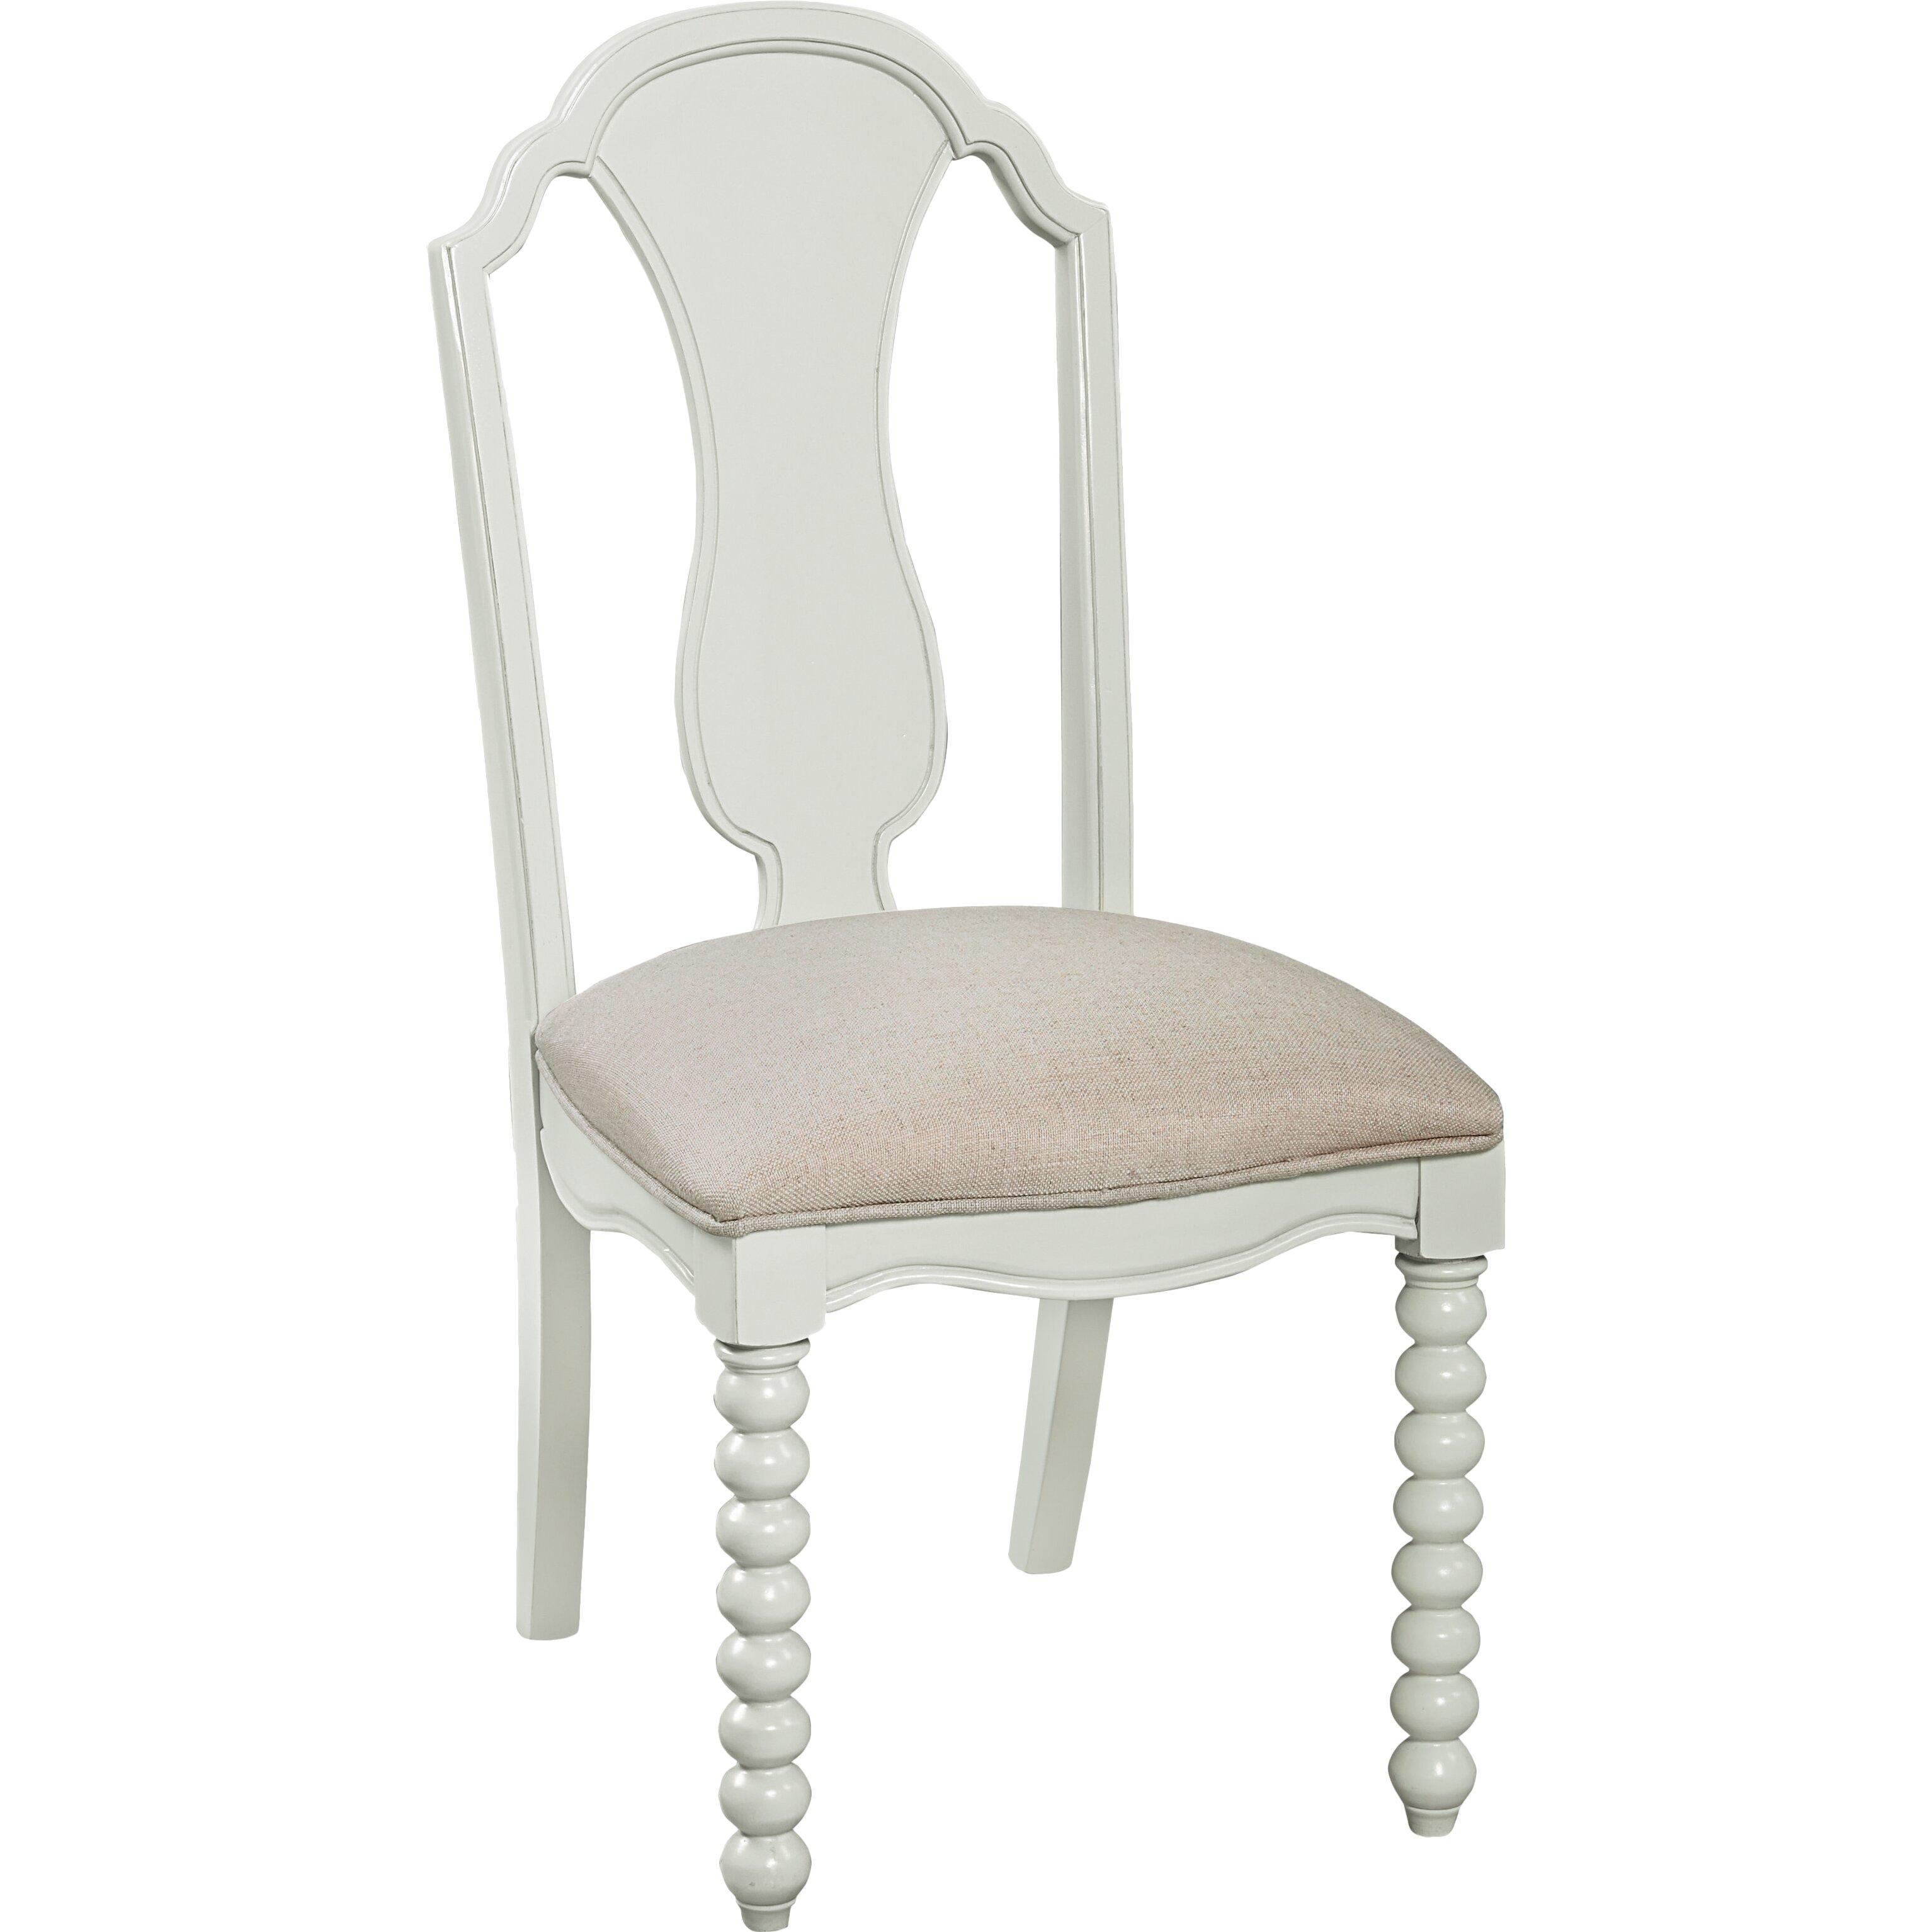 wid desk target dobby office print hei a cow linon draper fmt chair linen p beige